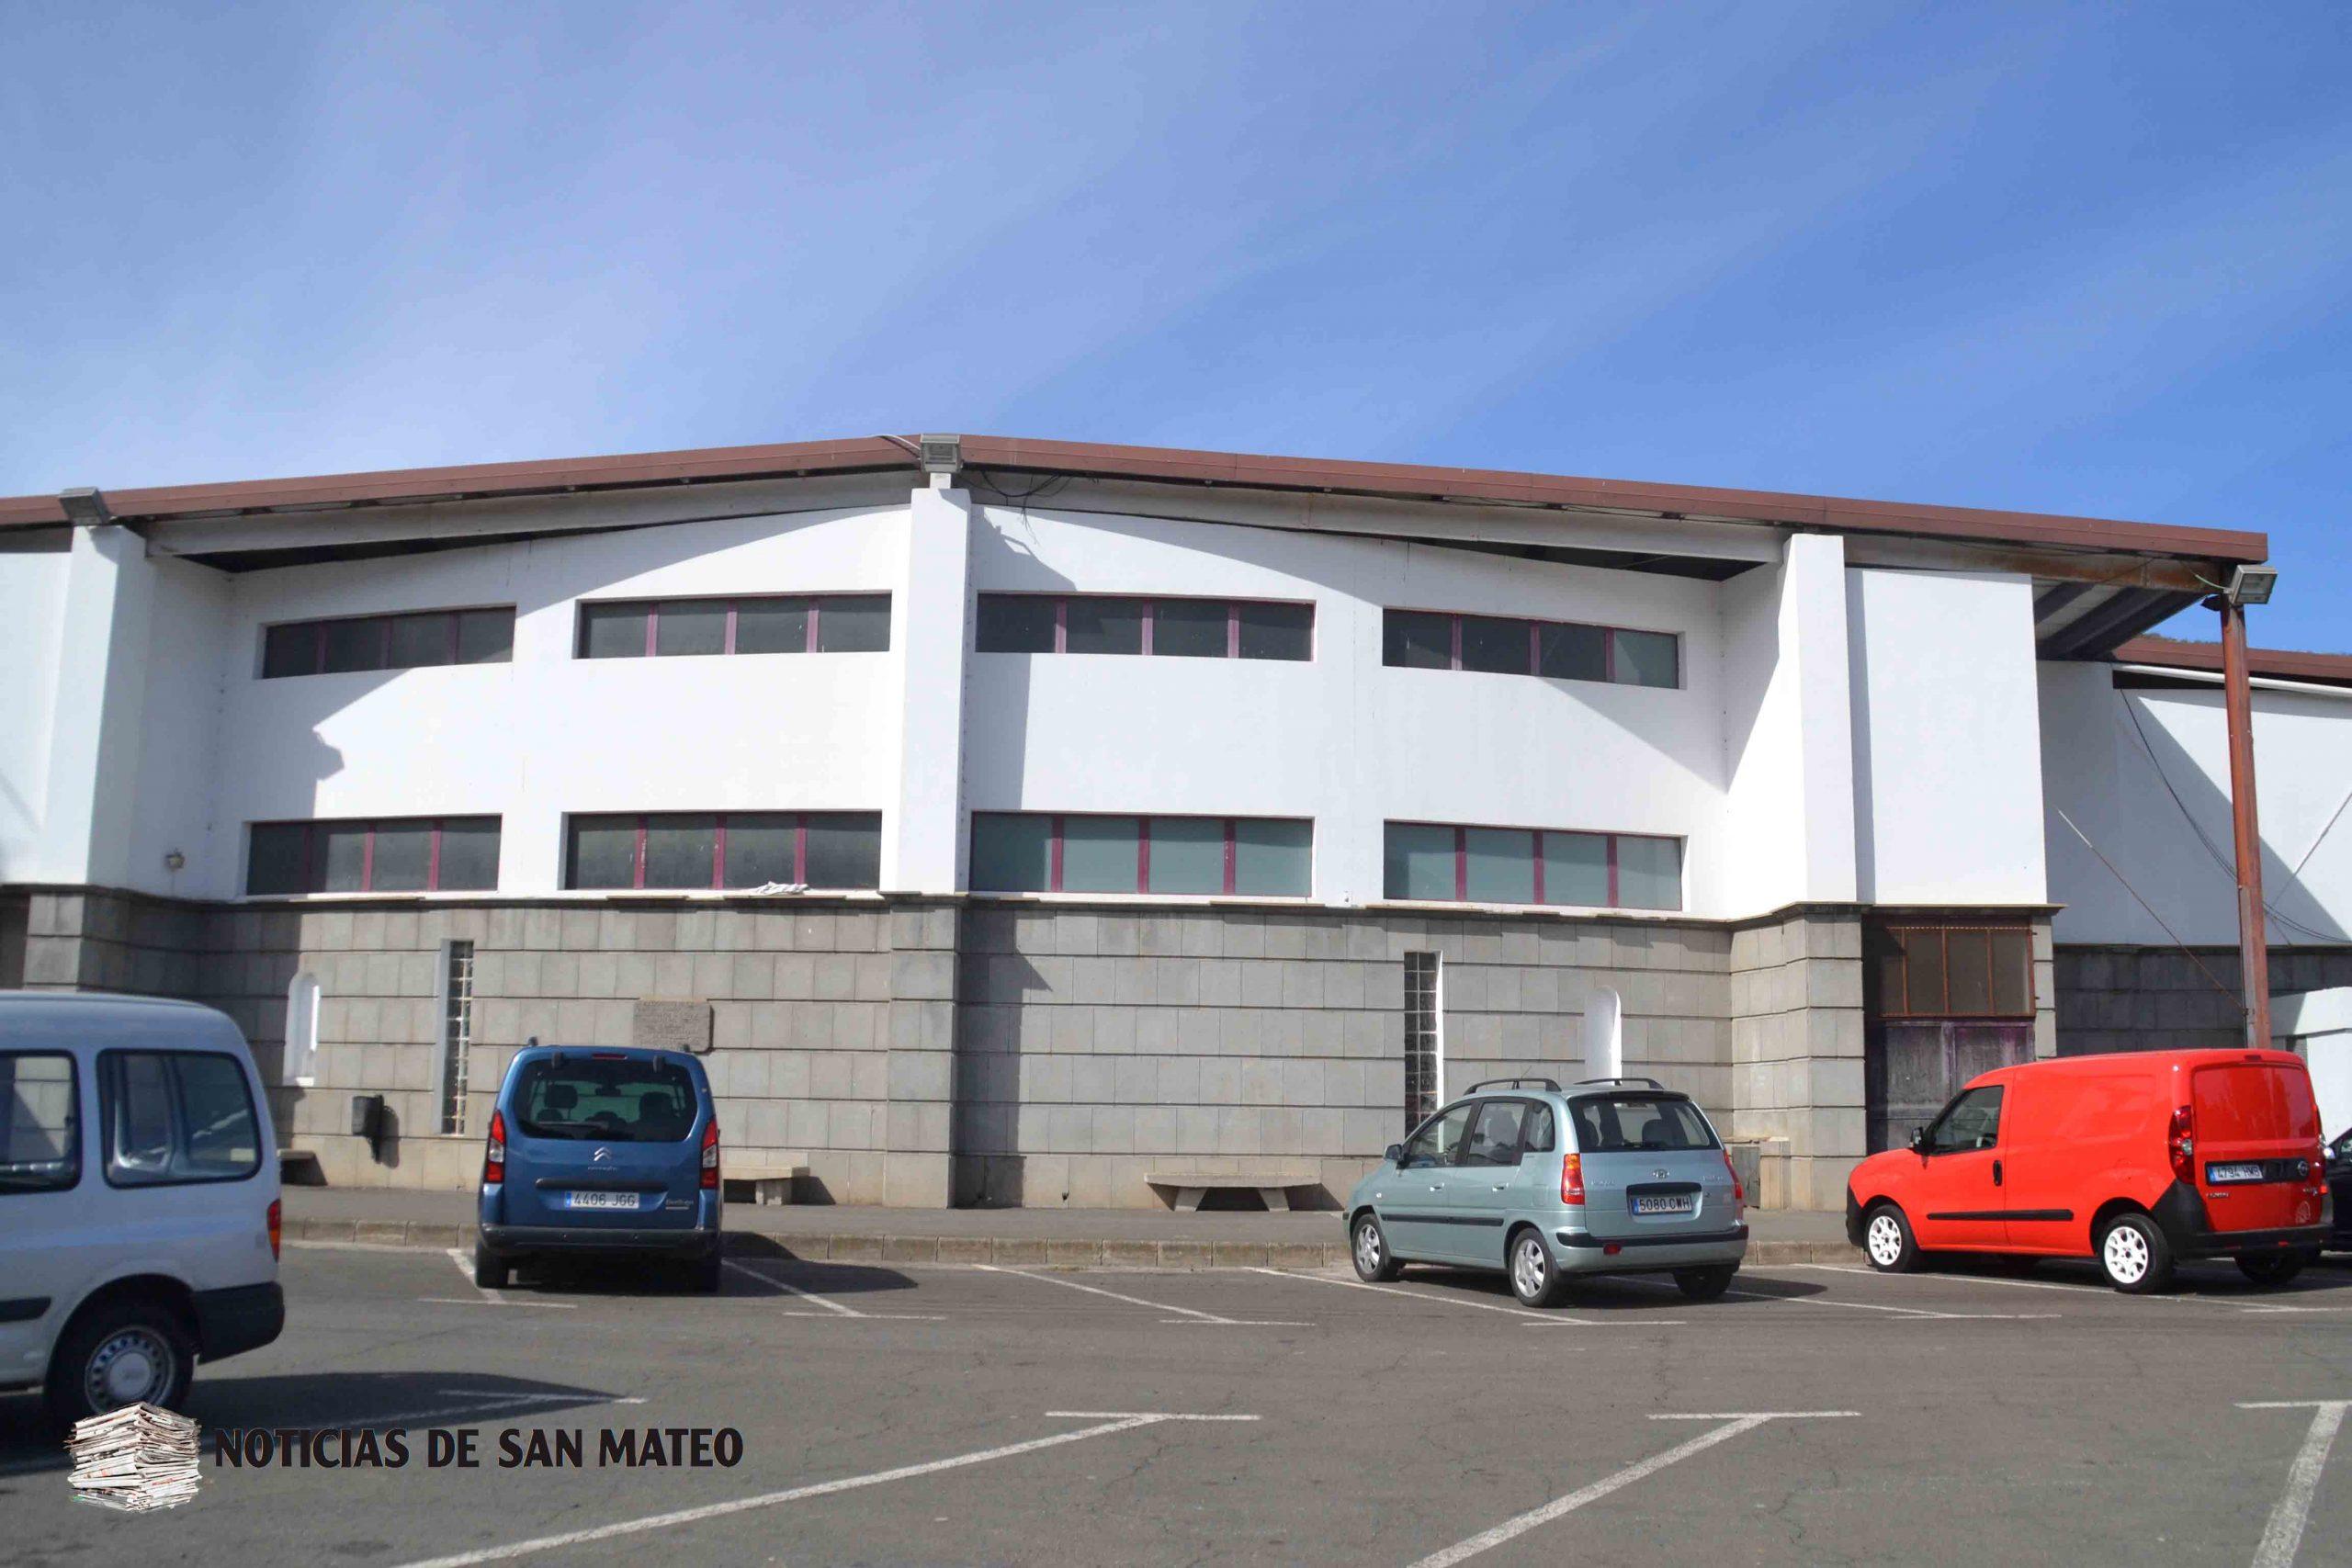 Dos empresas presentan oferta para la obra del polideportivo municipal